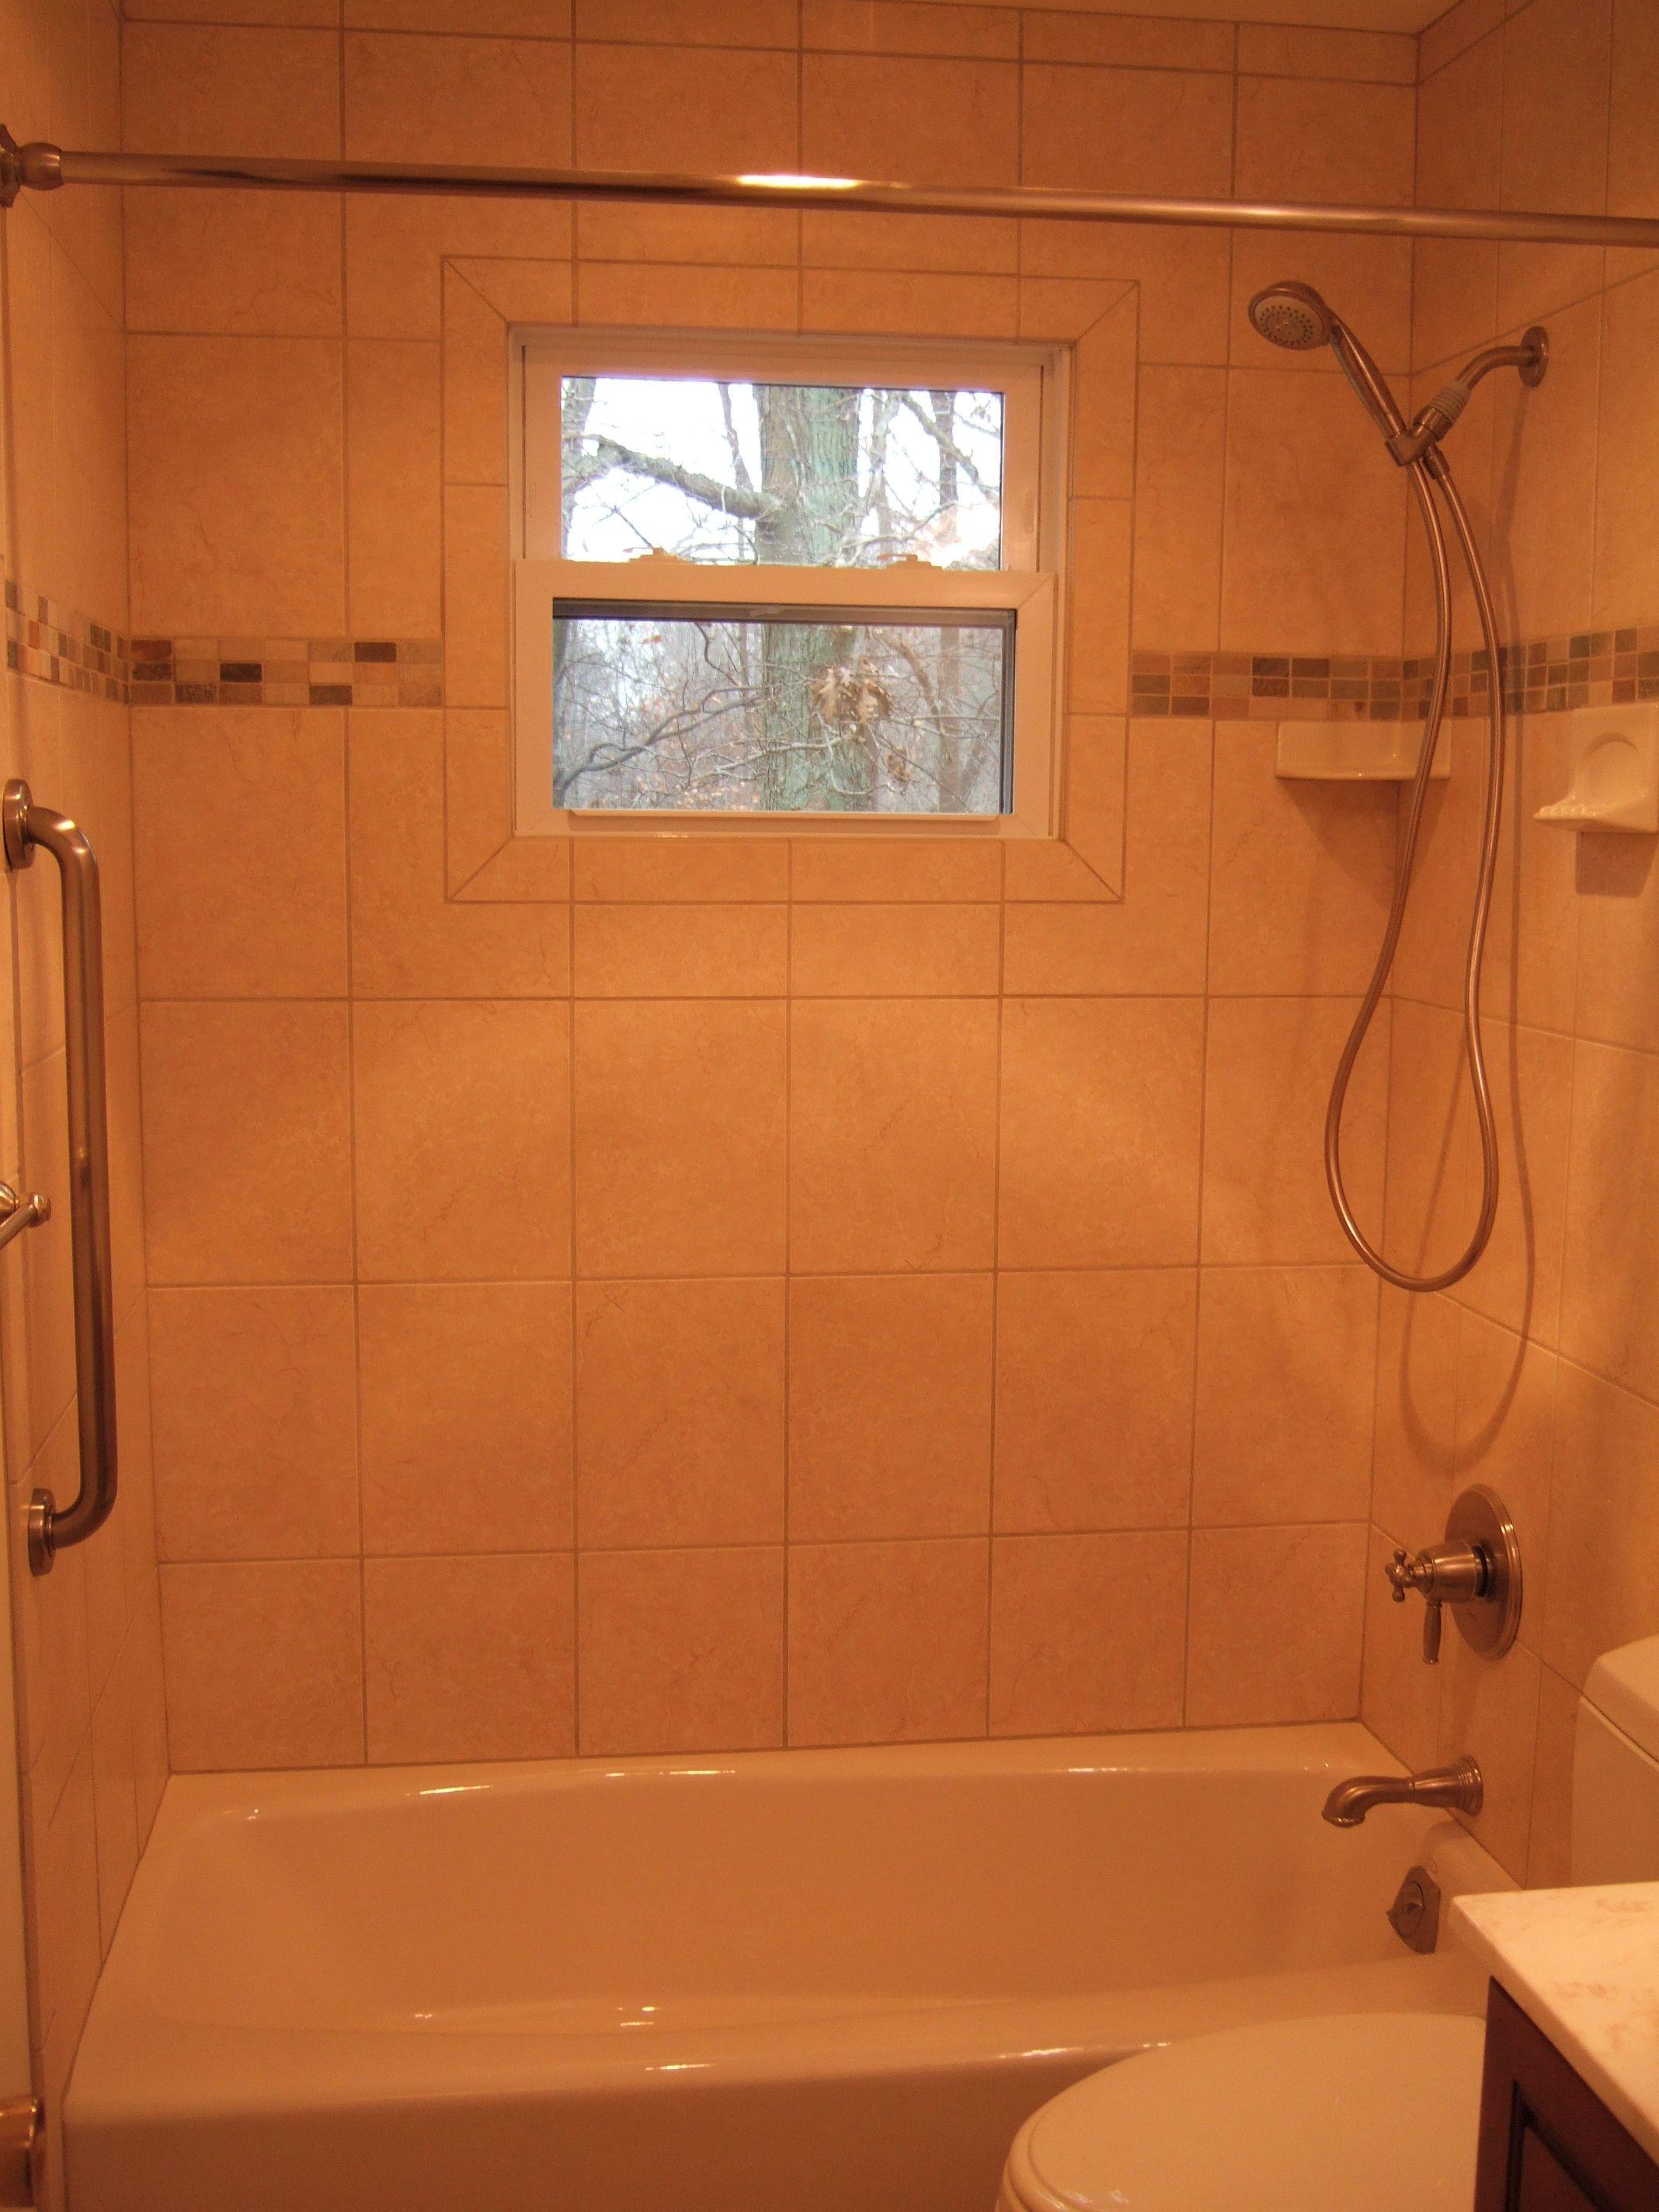 Bathroom Windows Over Shower fiberglass tubs and walls idea | main bathroom tub shower with